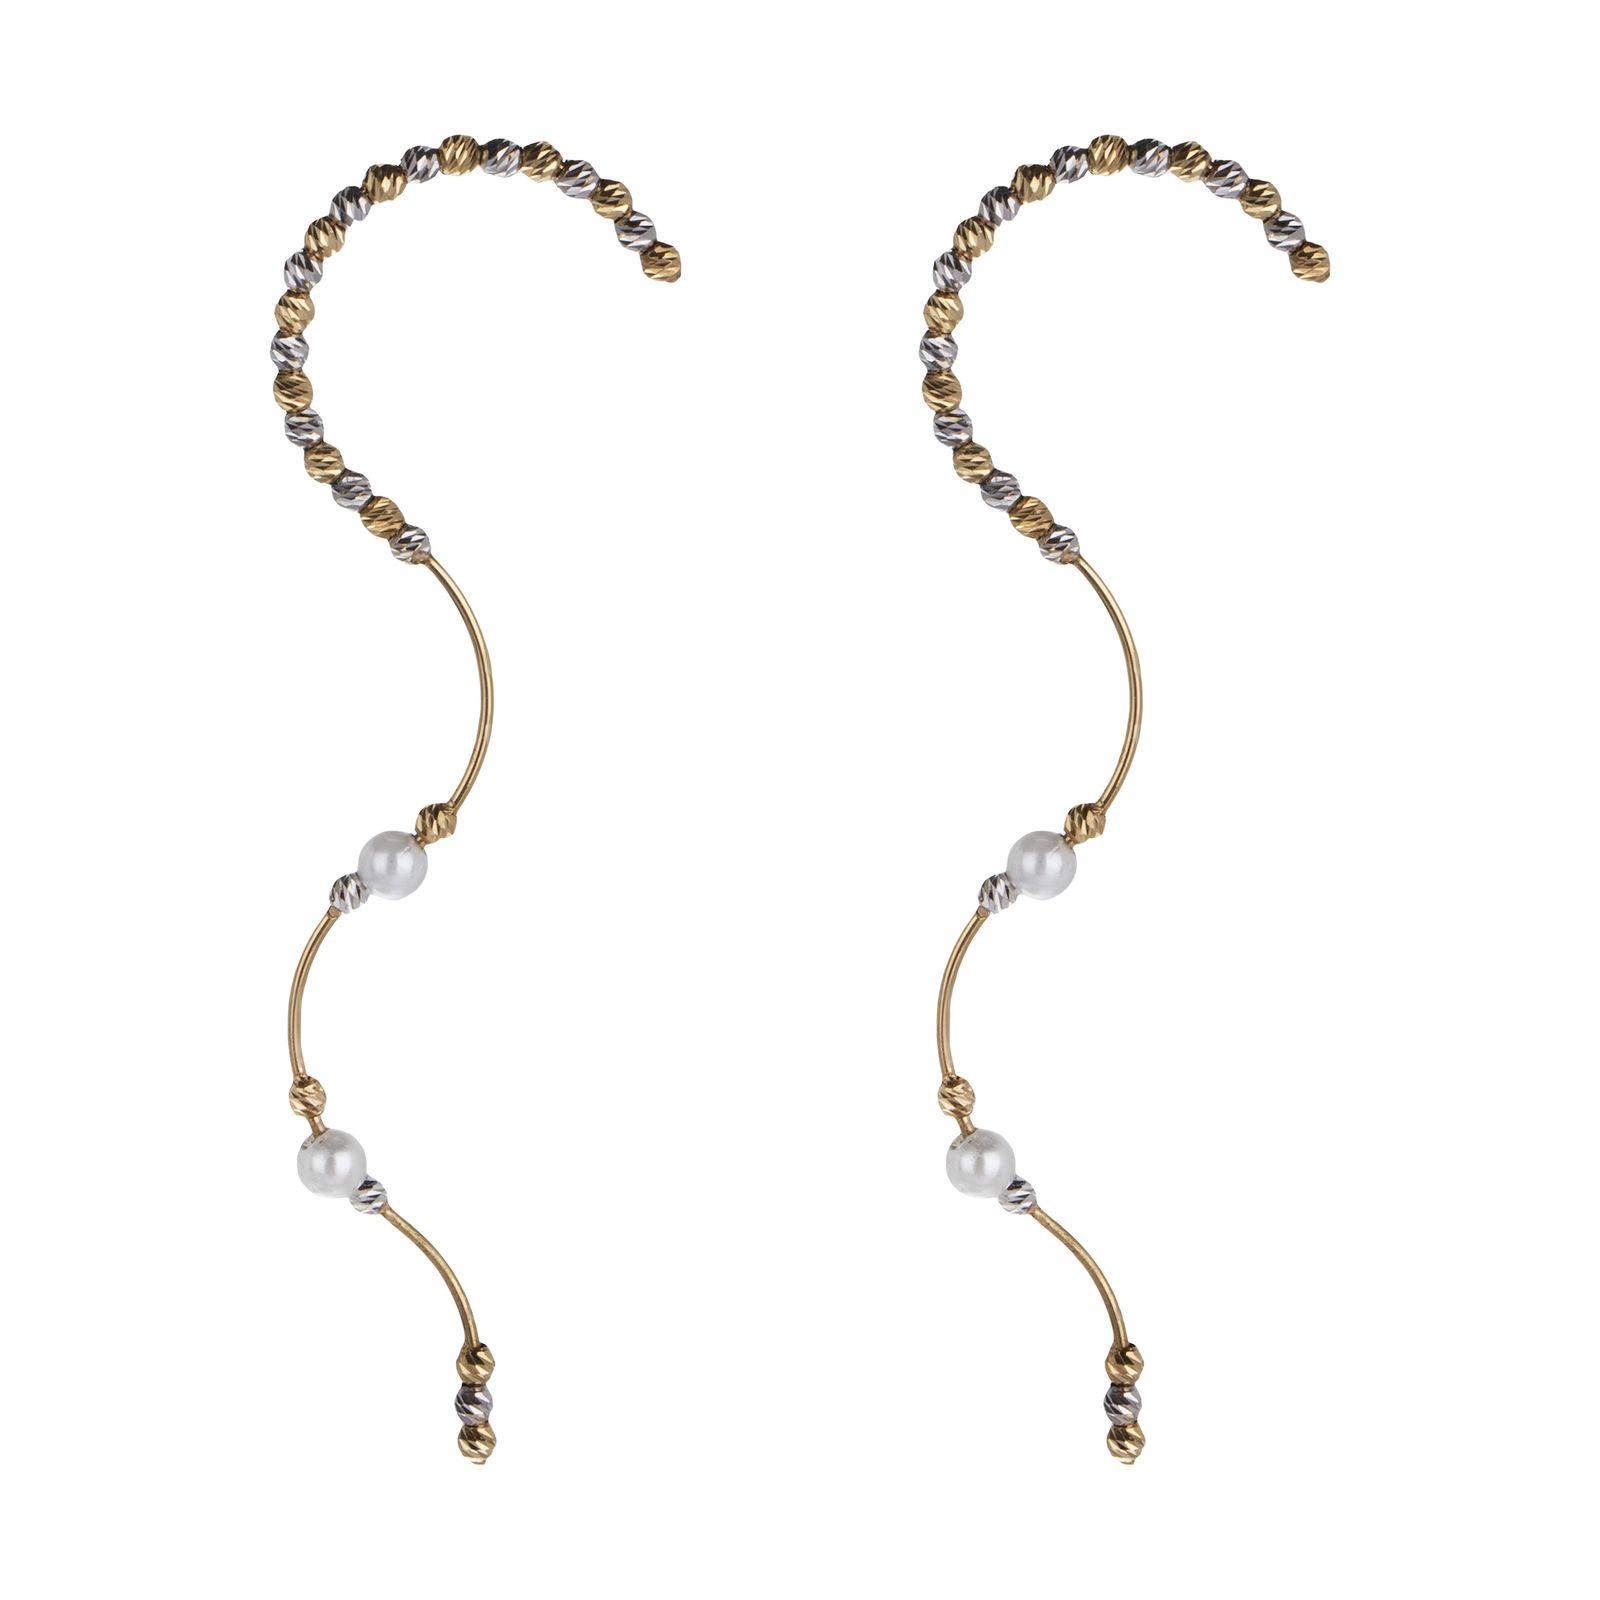 گوشواره طلا 18 عیار زنانه سیودو مدل 146436 -  - 2